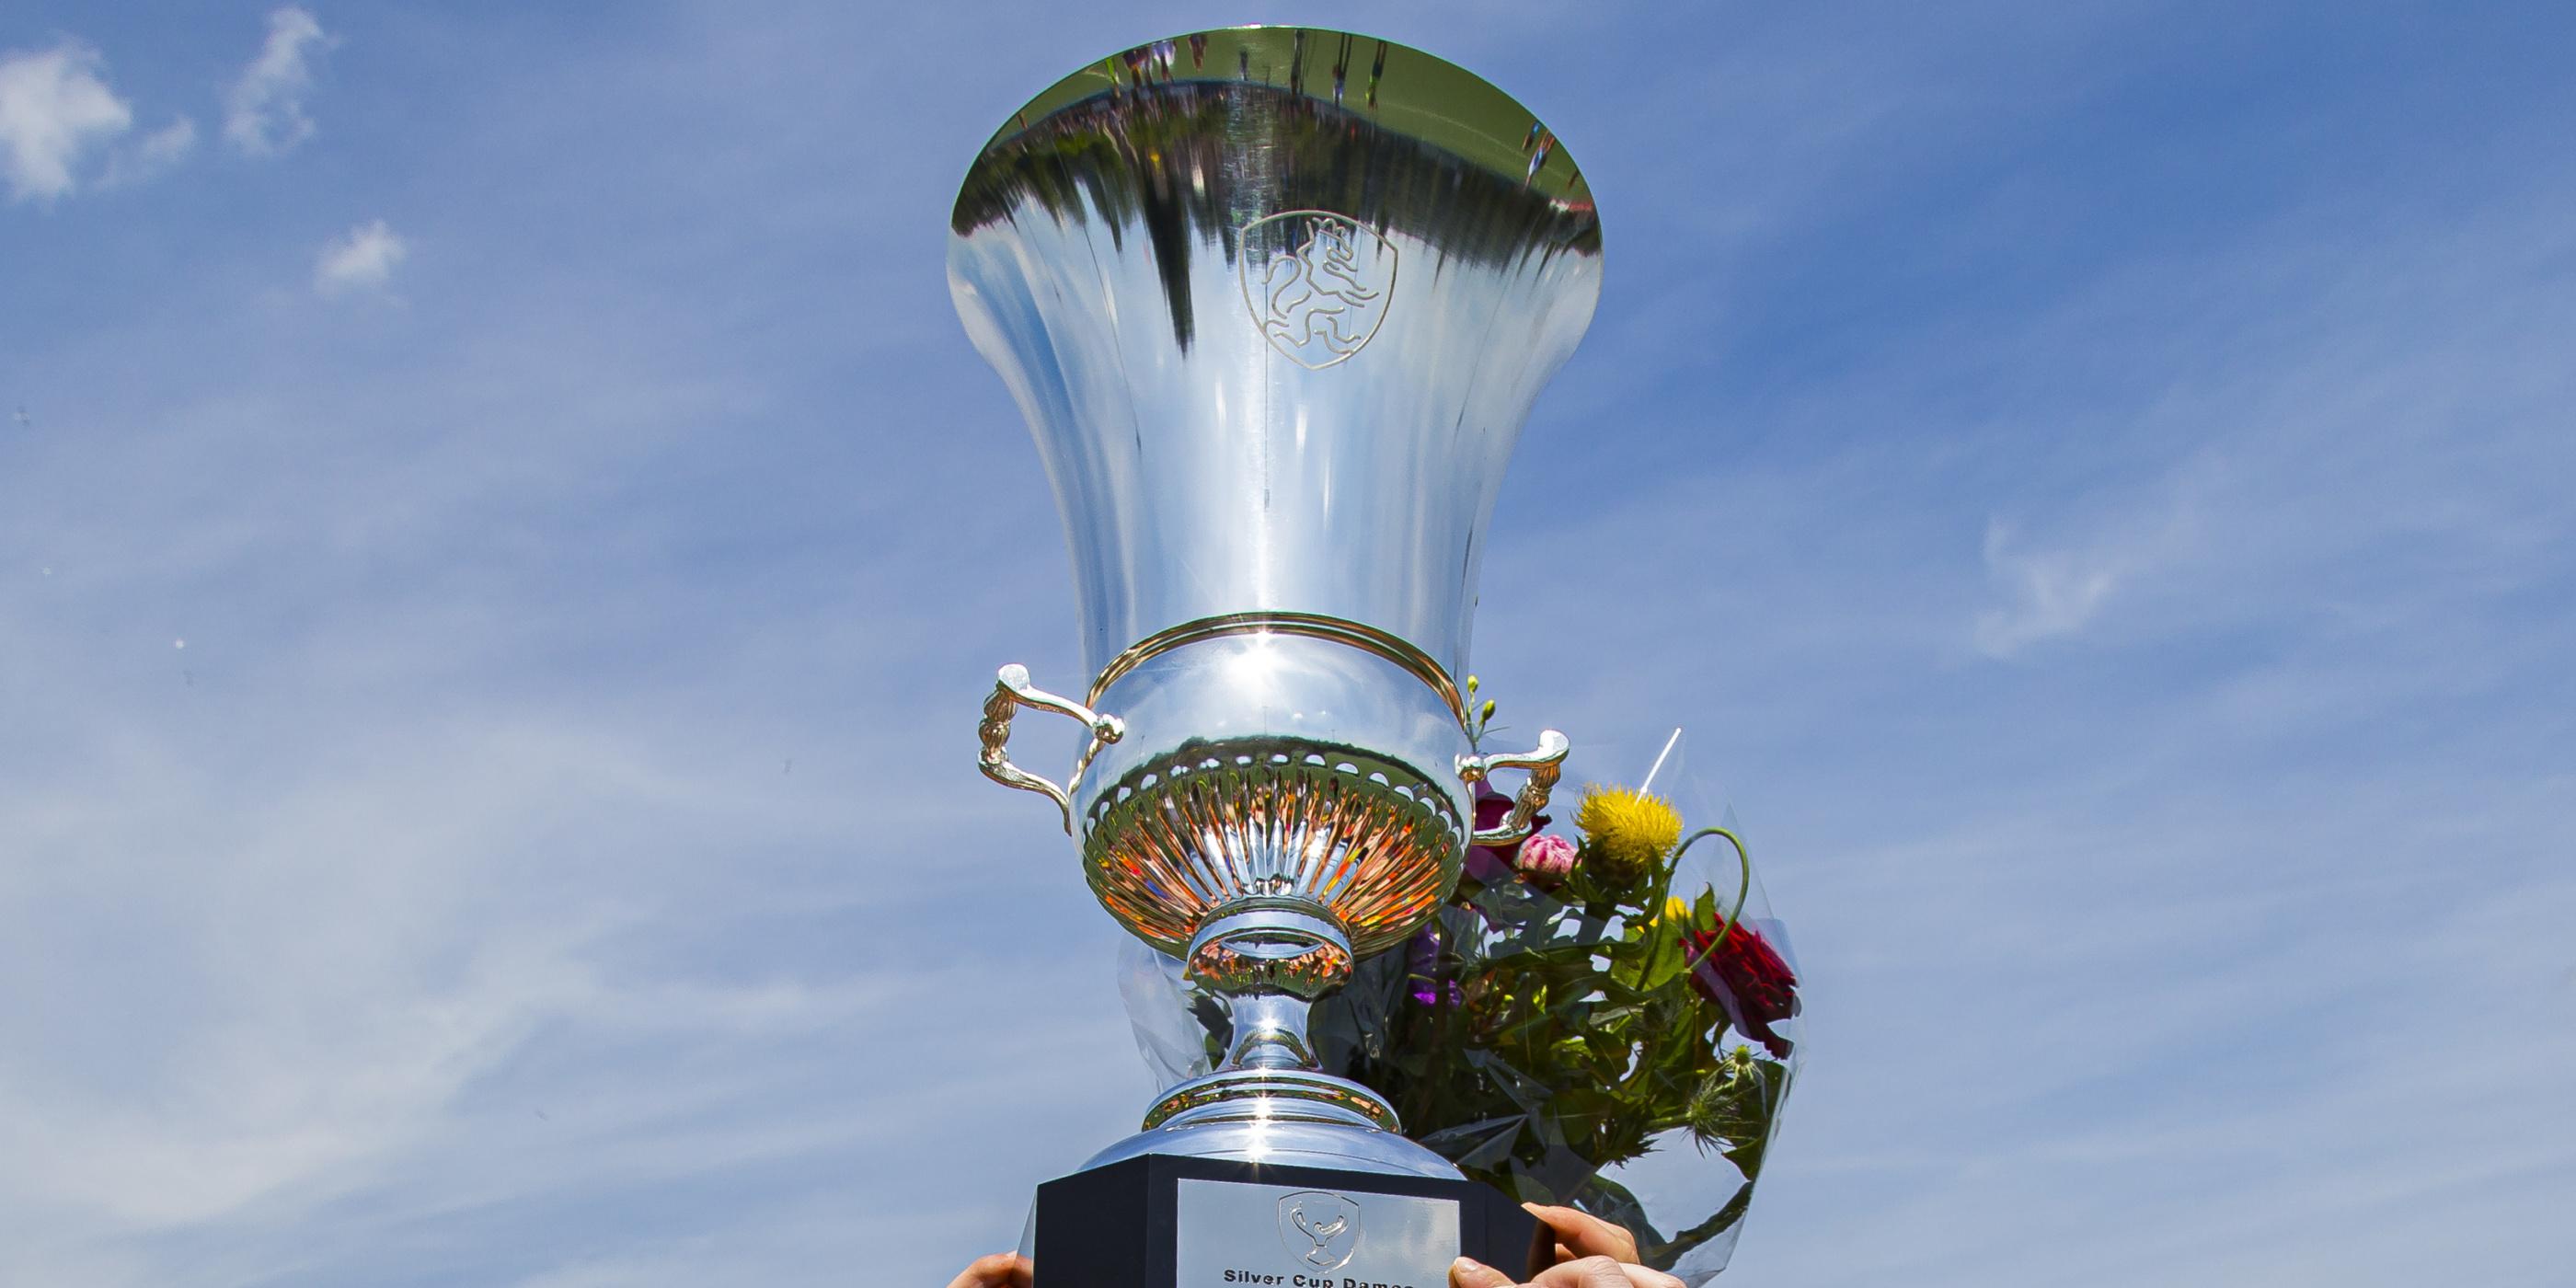 Loting Silver Cup Dames en Gold Cup Heren ronde 3